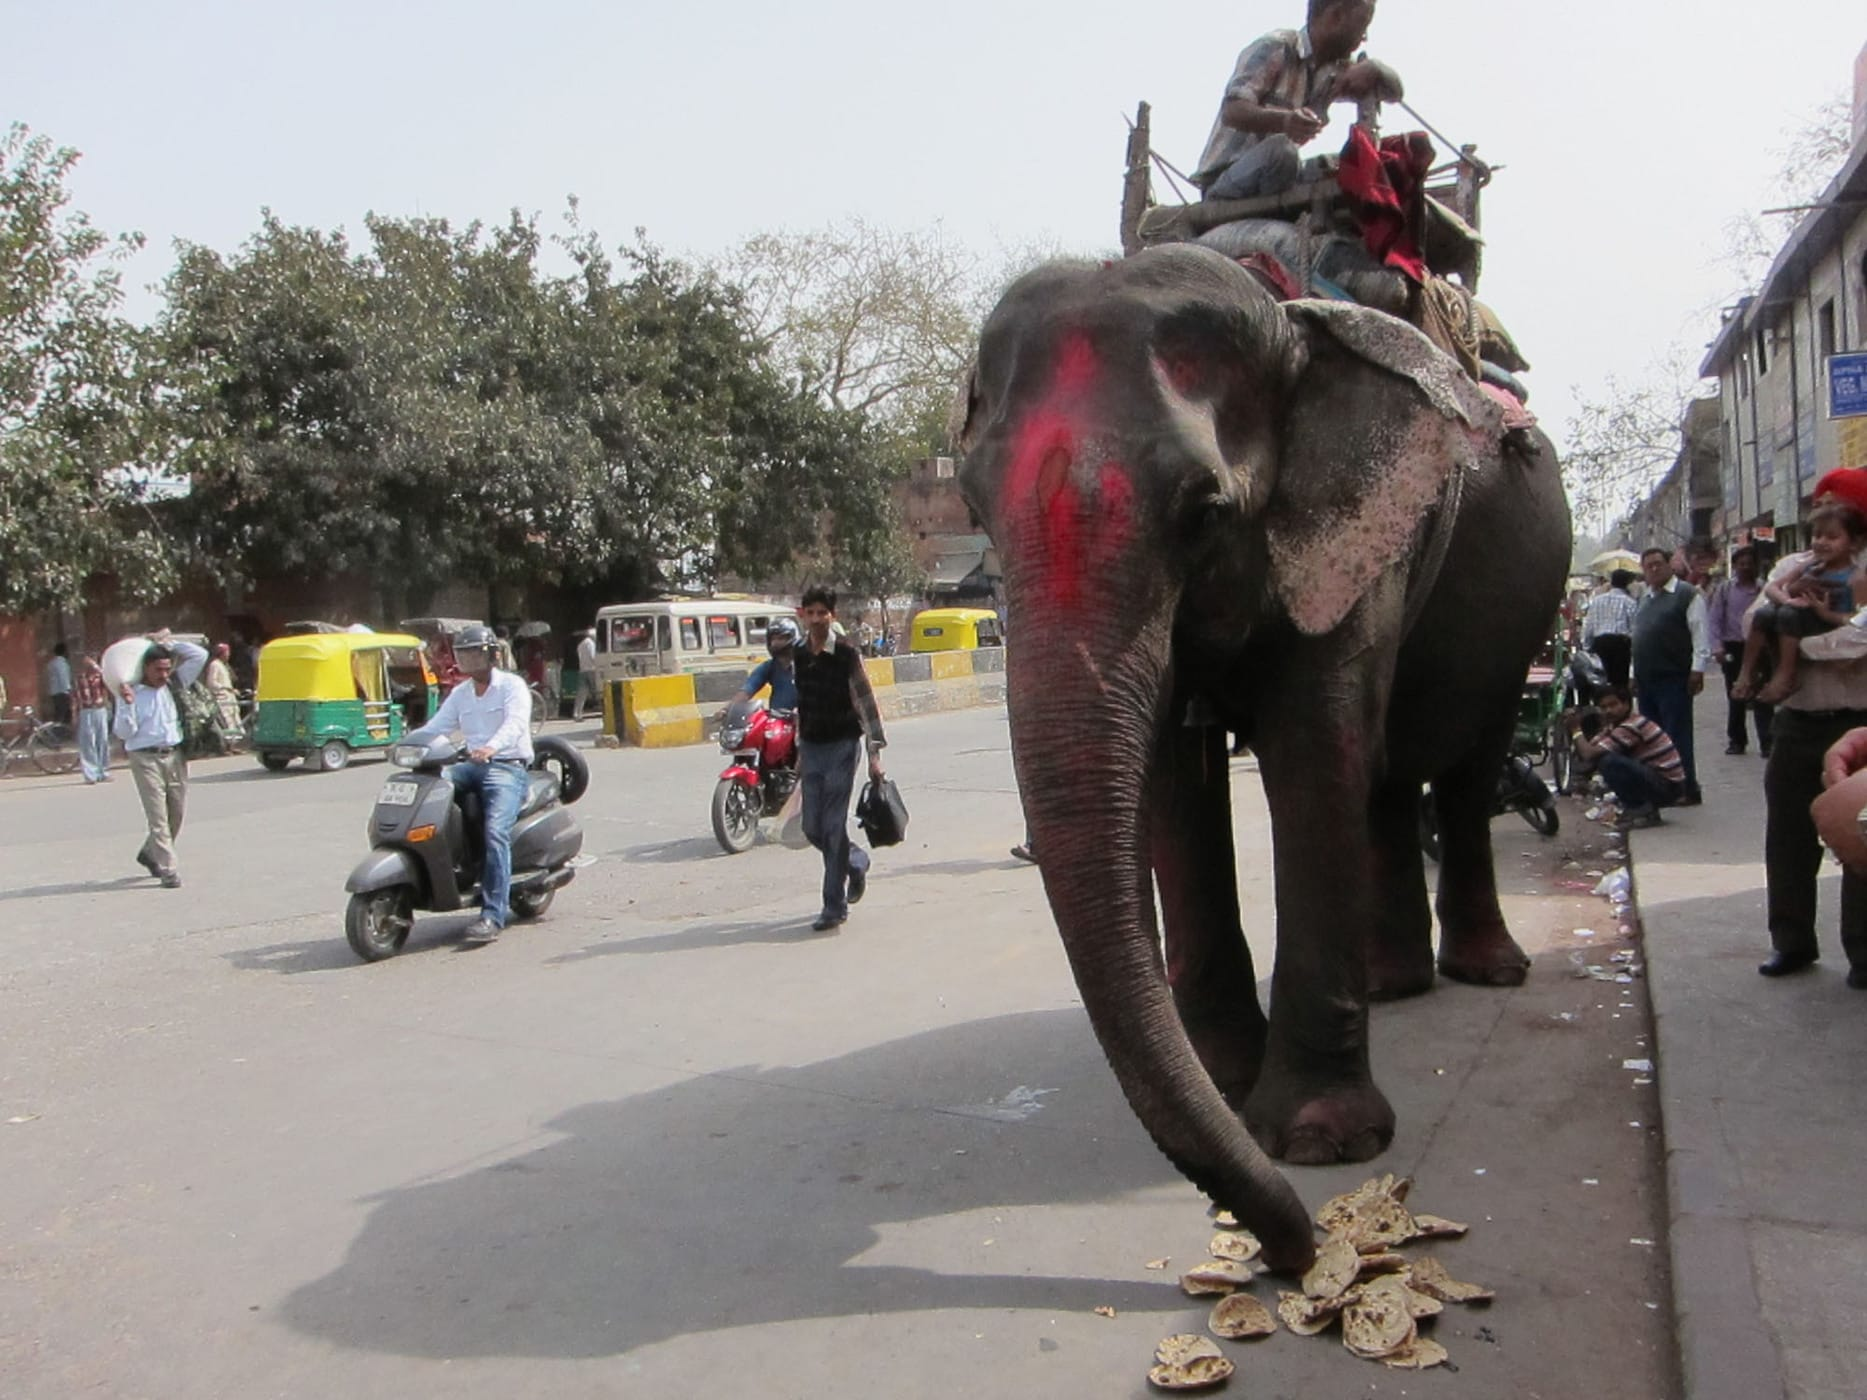 Elephant on the streets of New Delhi, India.